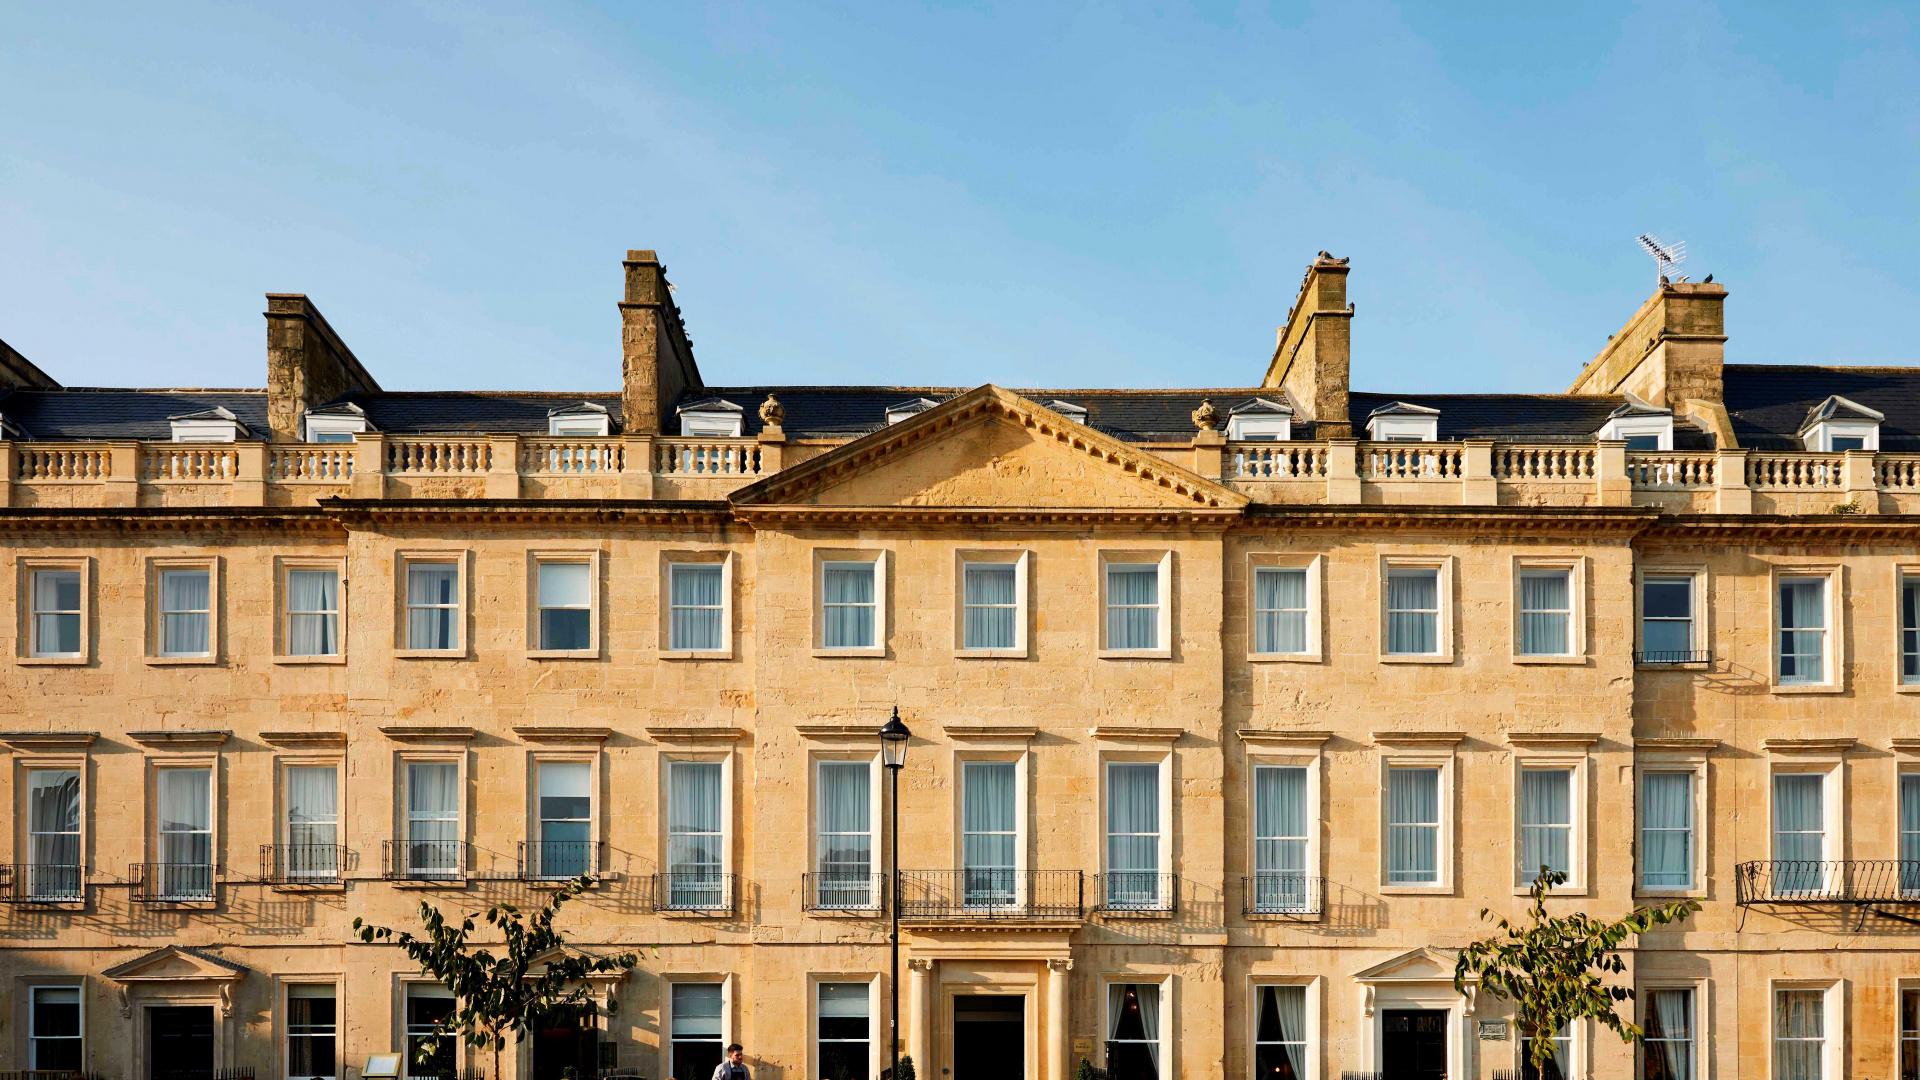 Hotel Indigo Bath review: the hotel exterior, Georgian style buildings in Bath